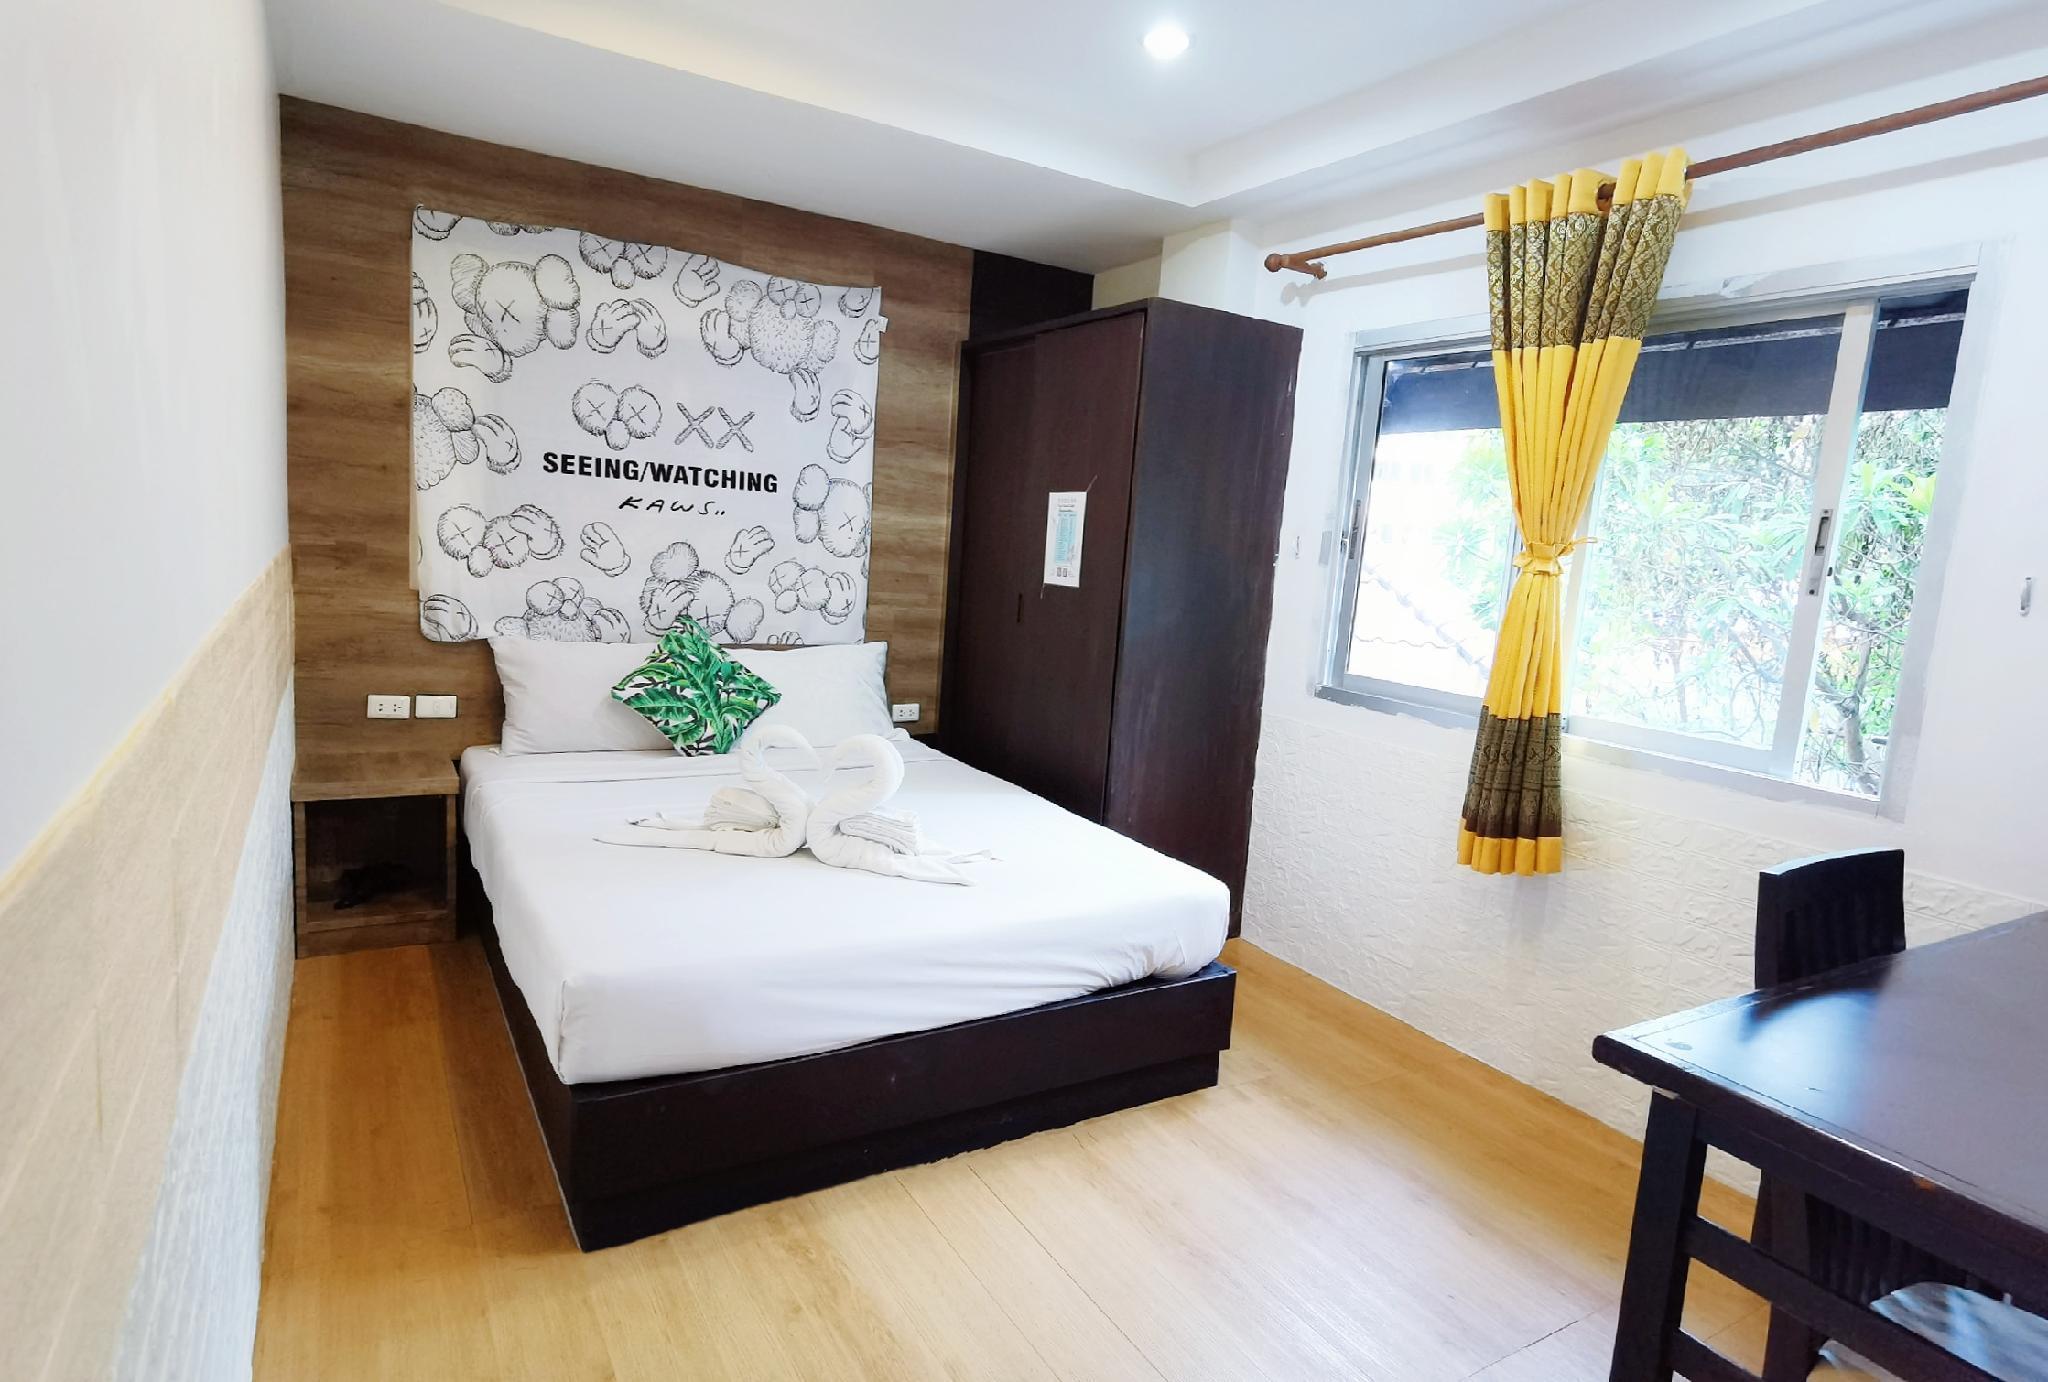 21Patong beach#Economy room#Near bangla road อพาร์ตเมนต์ 1 ห้องนอน 0 ห้องน้ำส่วนตัว ขนาด 25 ตร.ม. – ป่าตอง